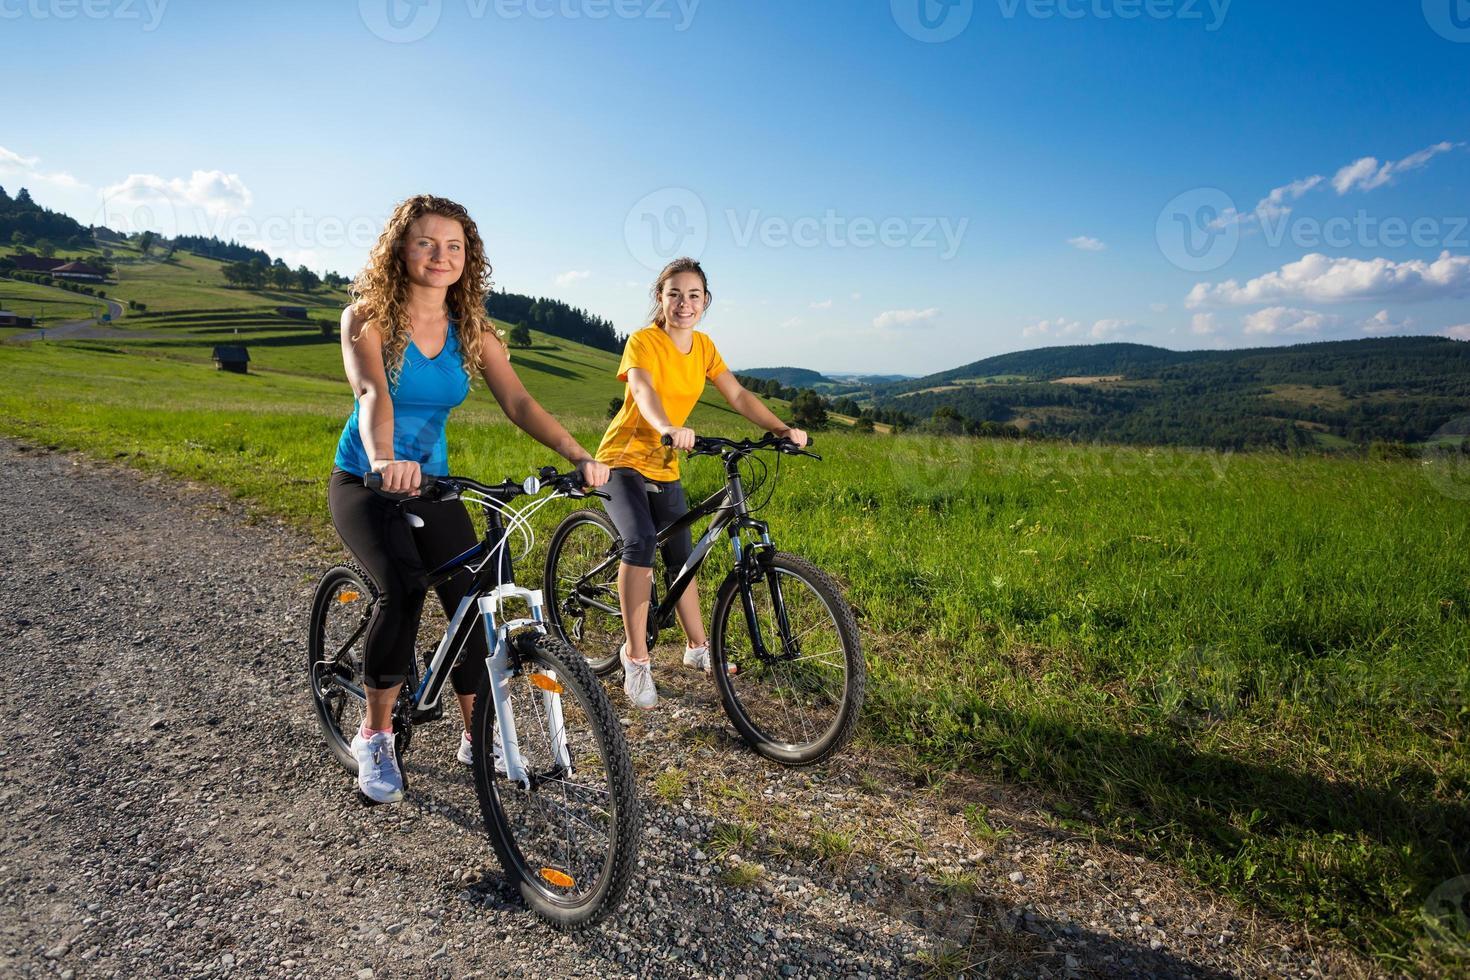 Two women riding bike photo